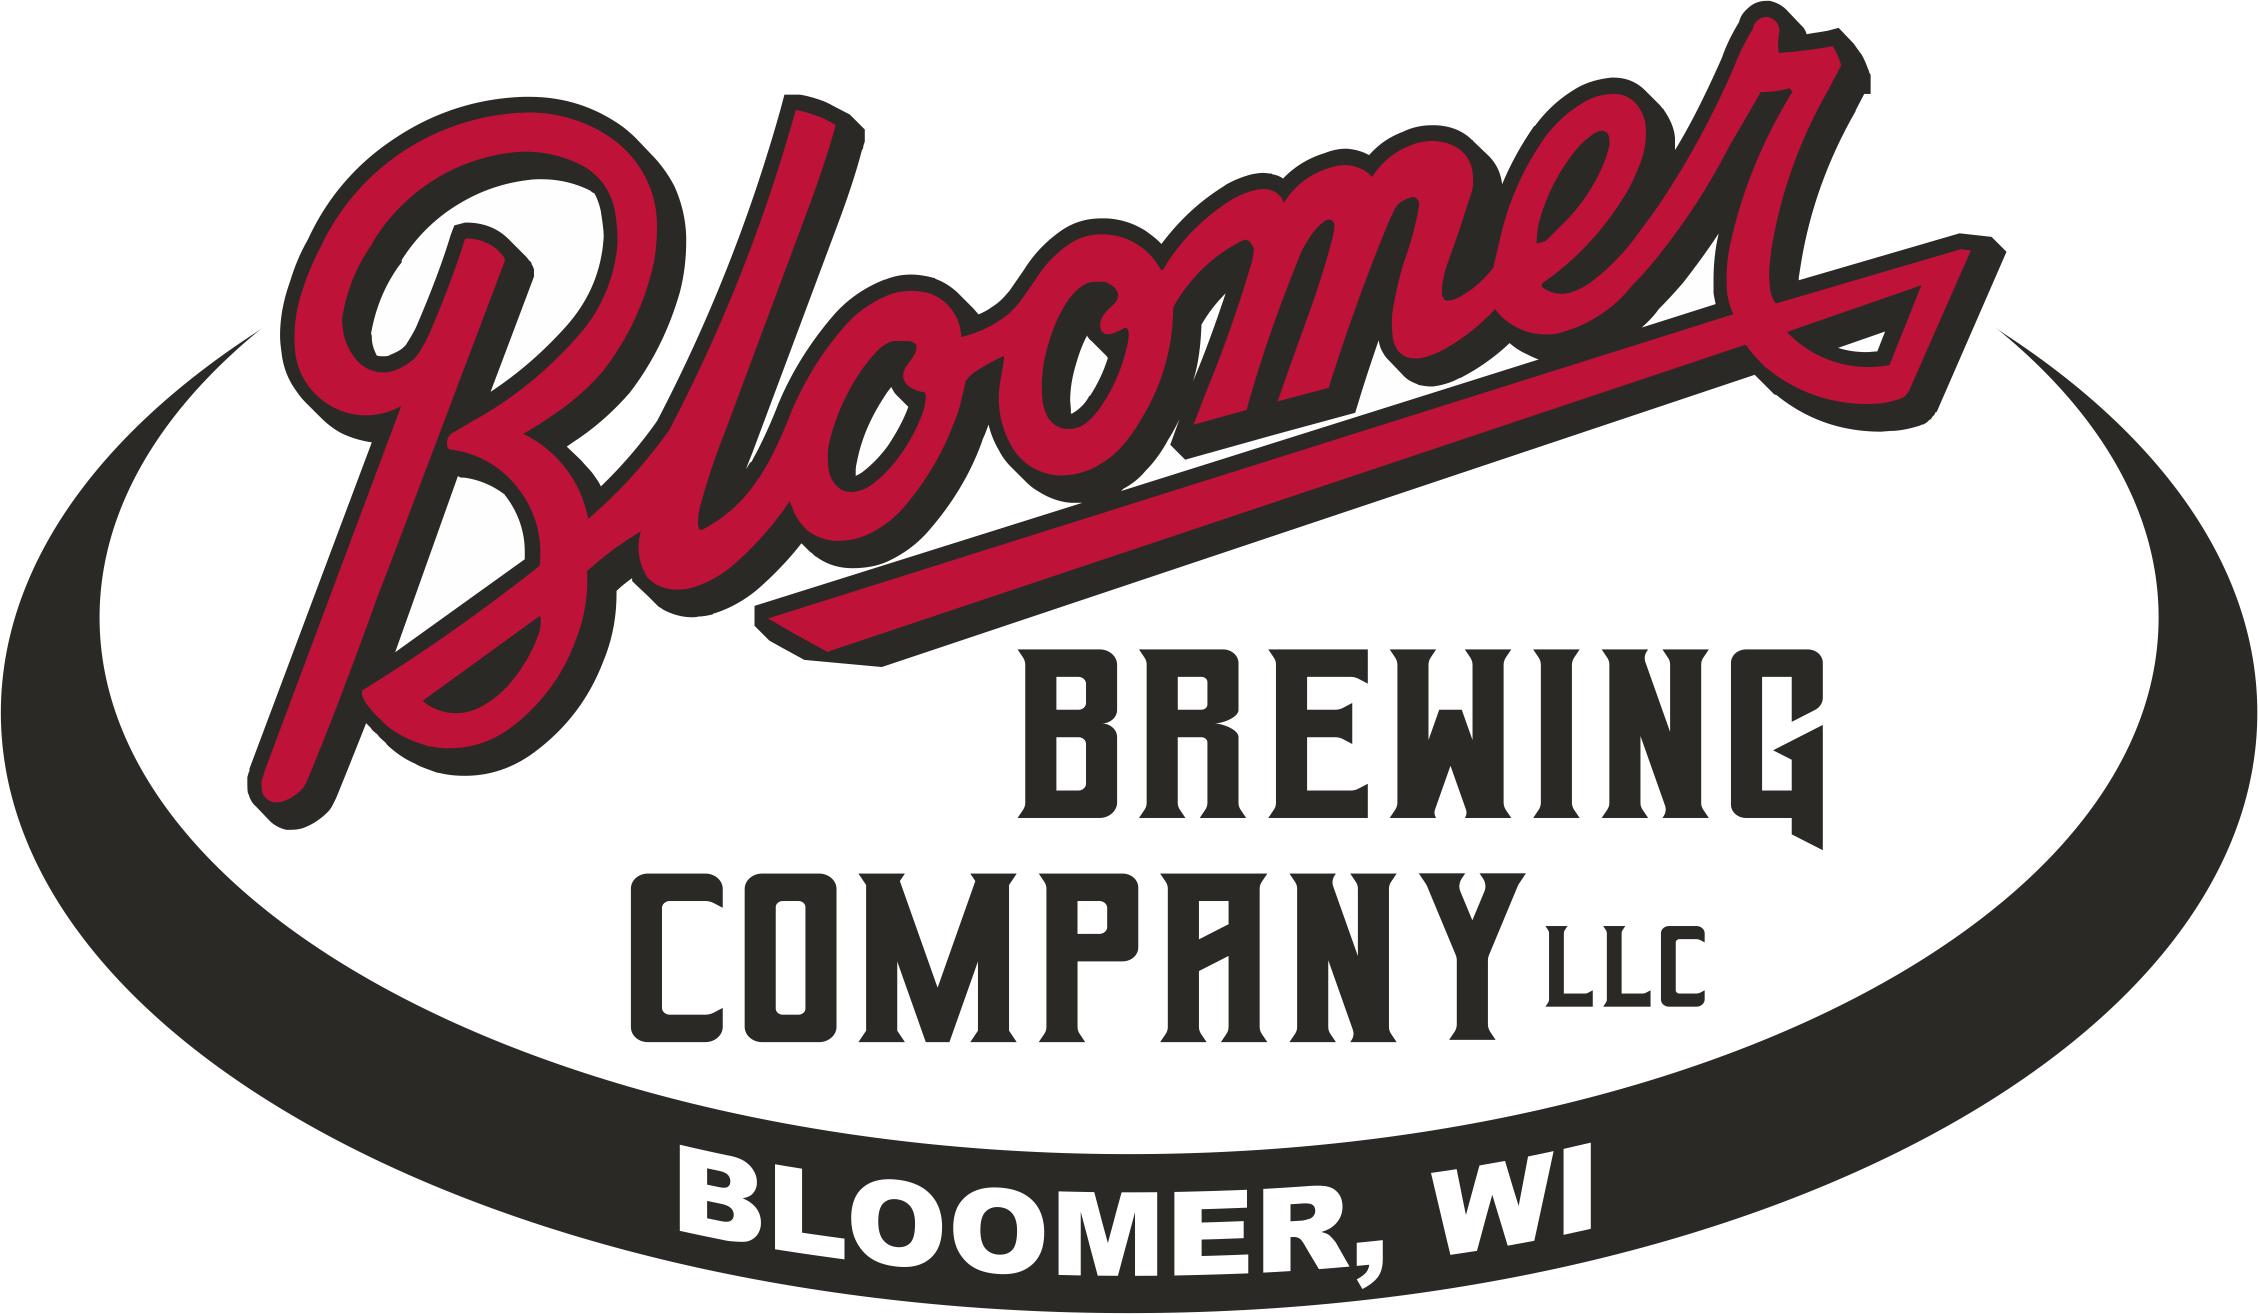 Bloomer Brewing Co., LLC